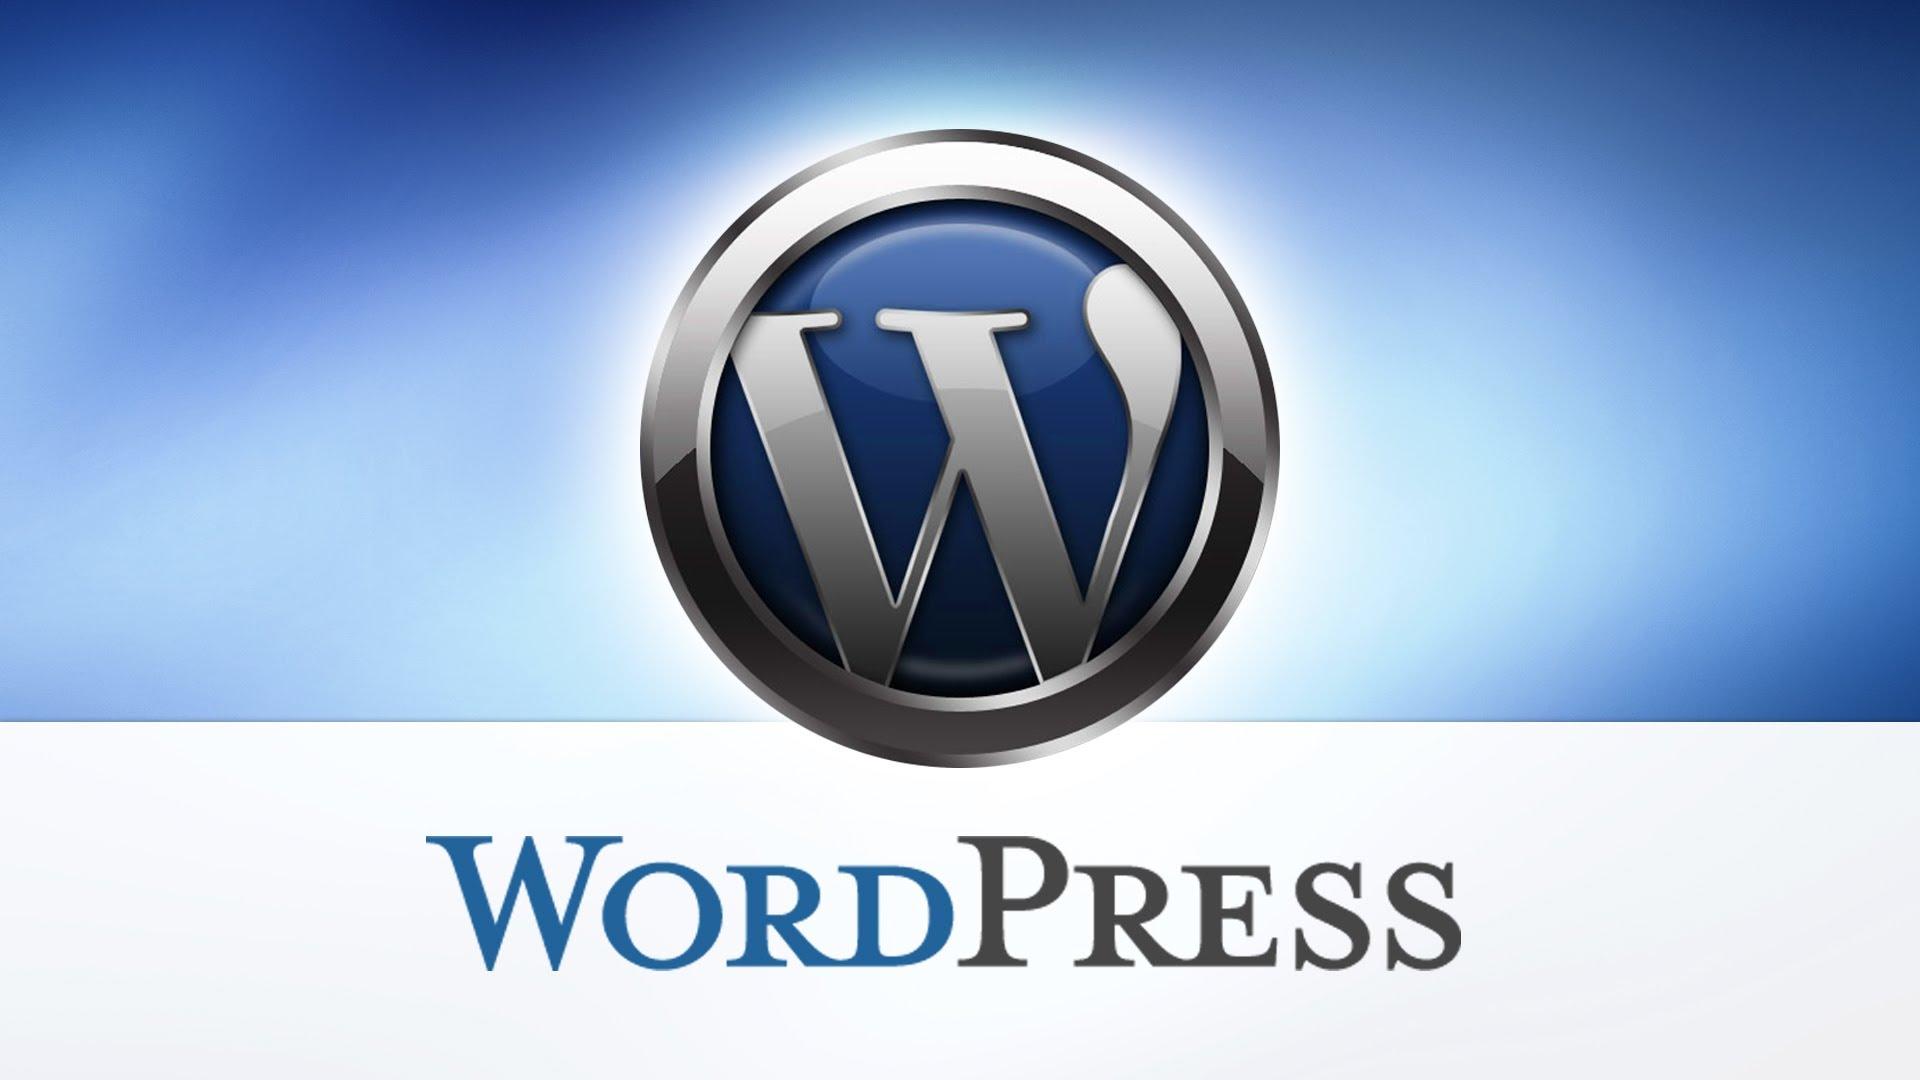 customize, create, fix your wordpress website